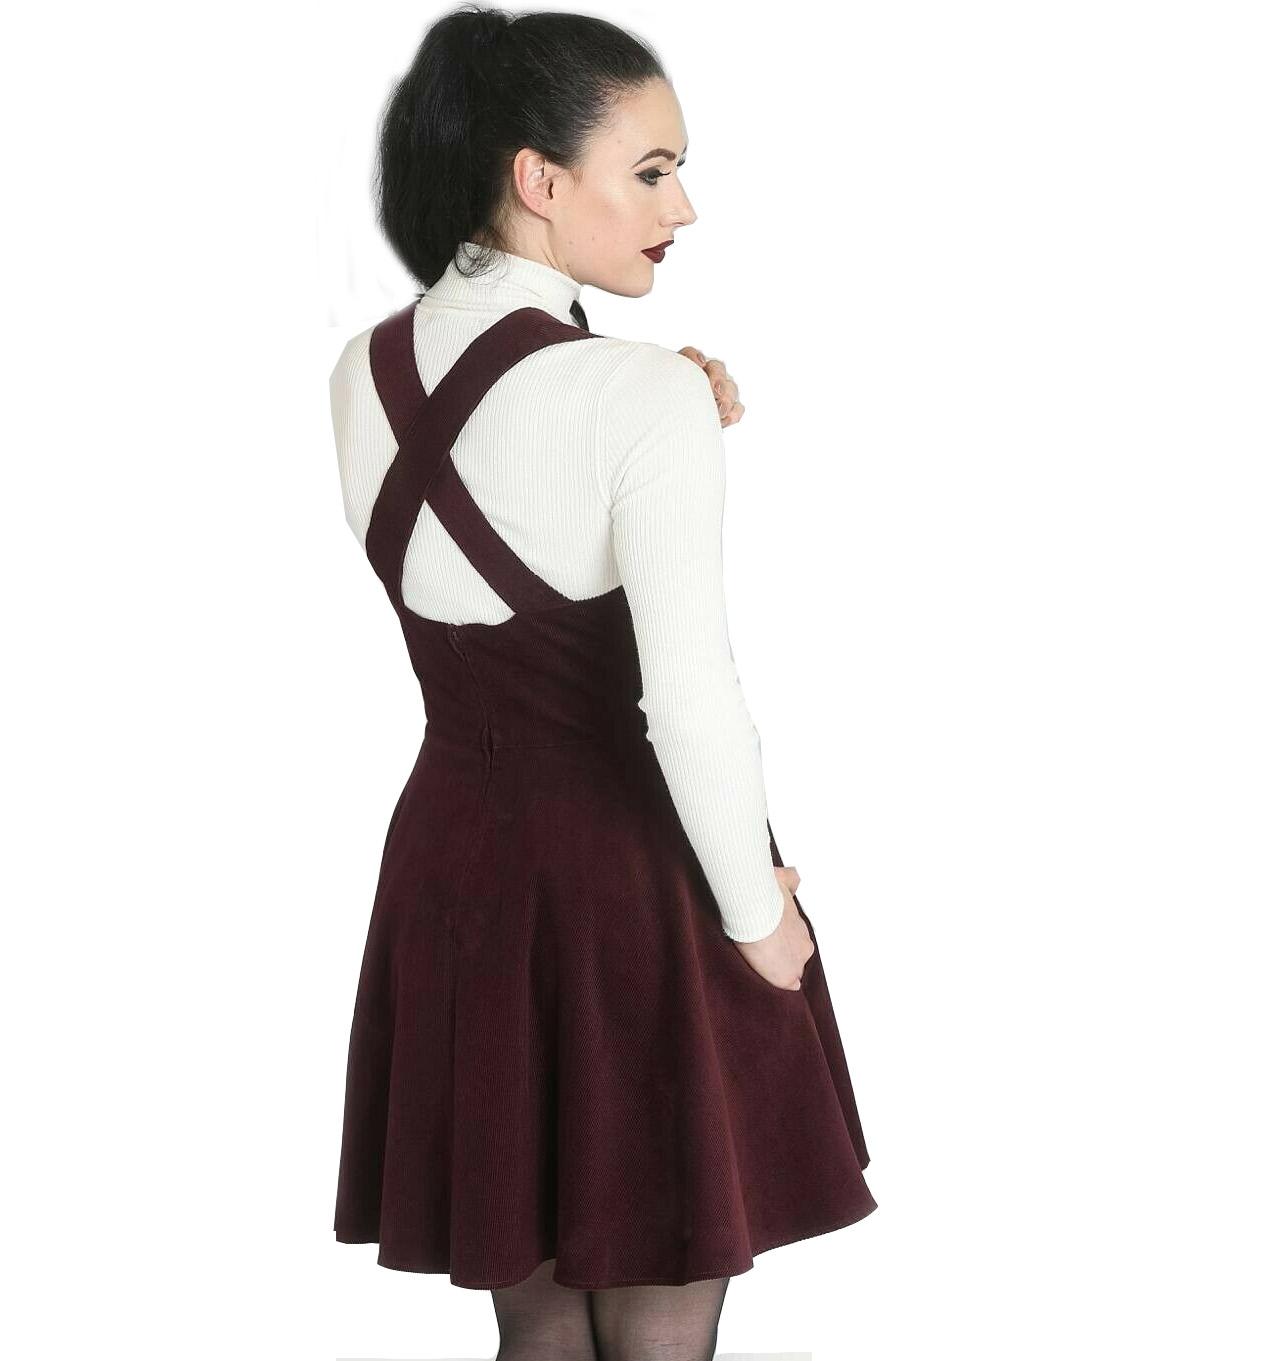 Hell-Bunny-Rockabilly-Corduroy-Mini-Dress-WONDER-YEARS-Pinafore-Wine-All-Sizes thumbnail 17